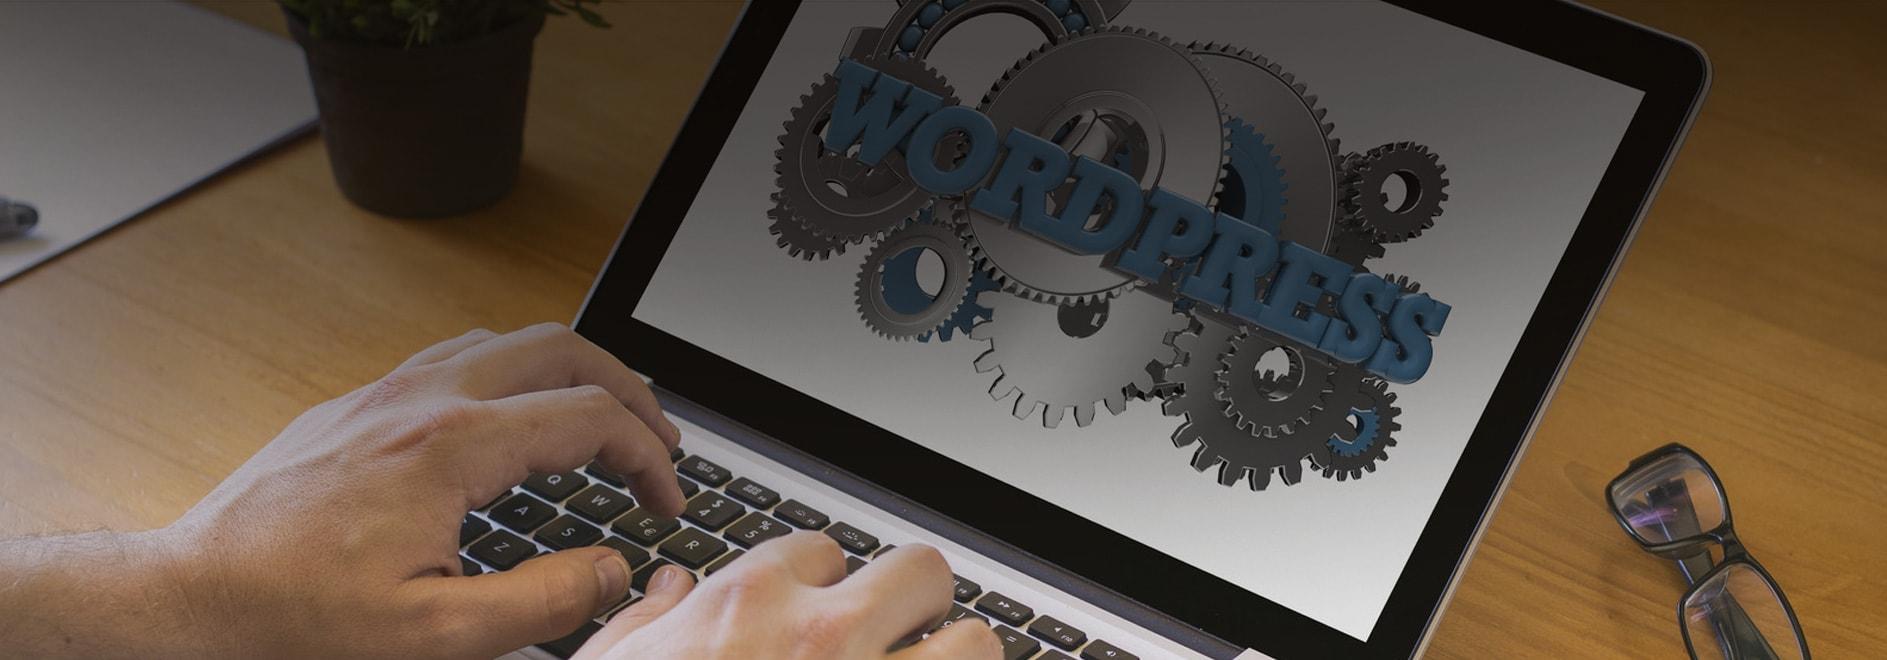 Word Press for websites